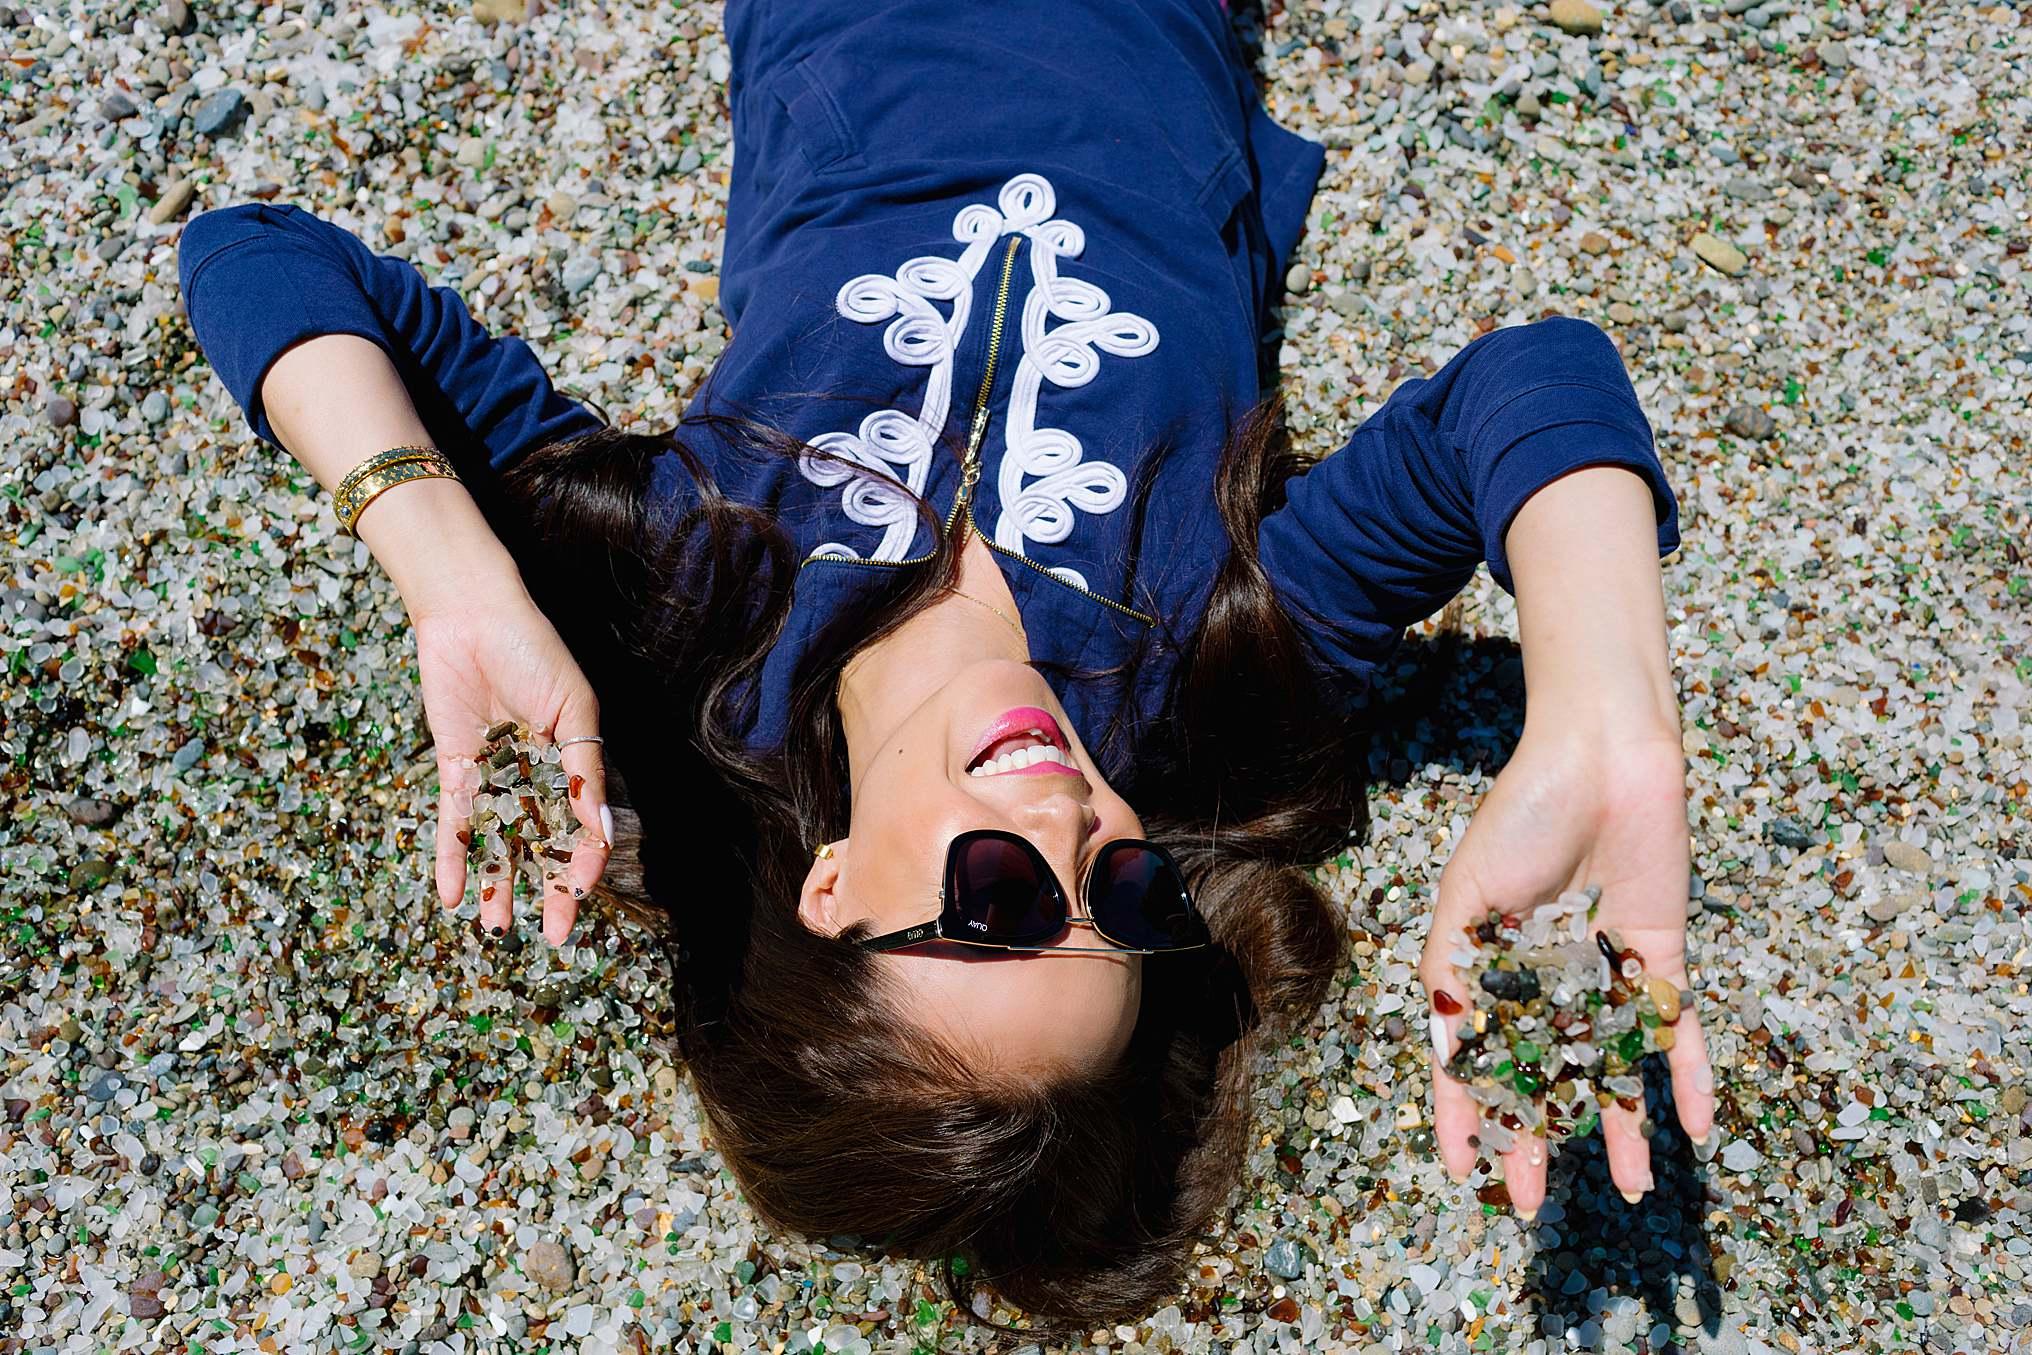 glass beach Mendocino County California lifestyle blogger Diana holding glass beach sand